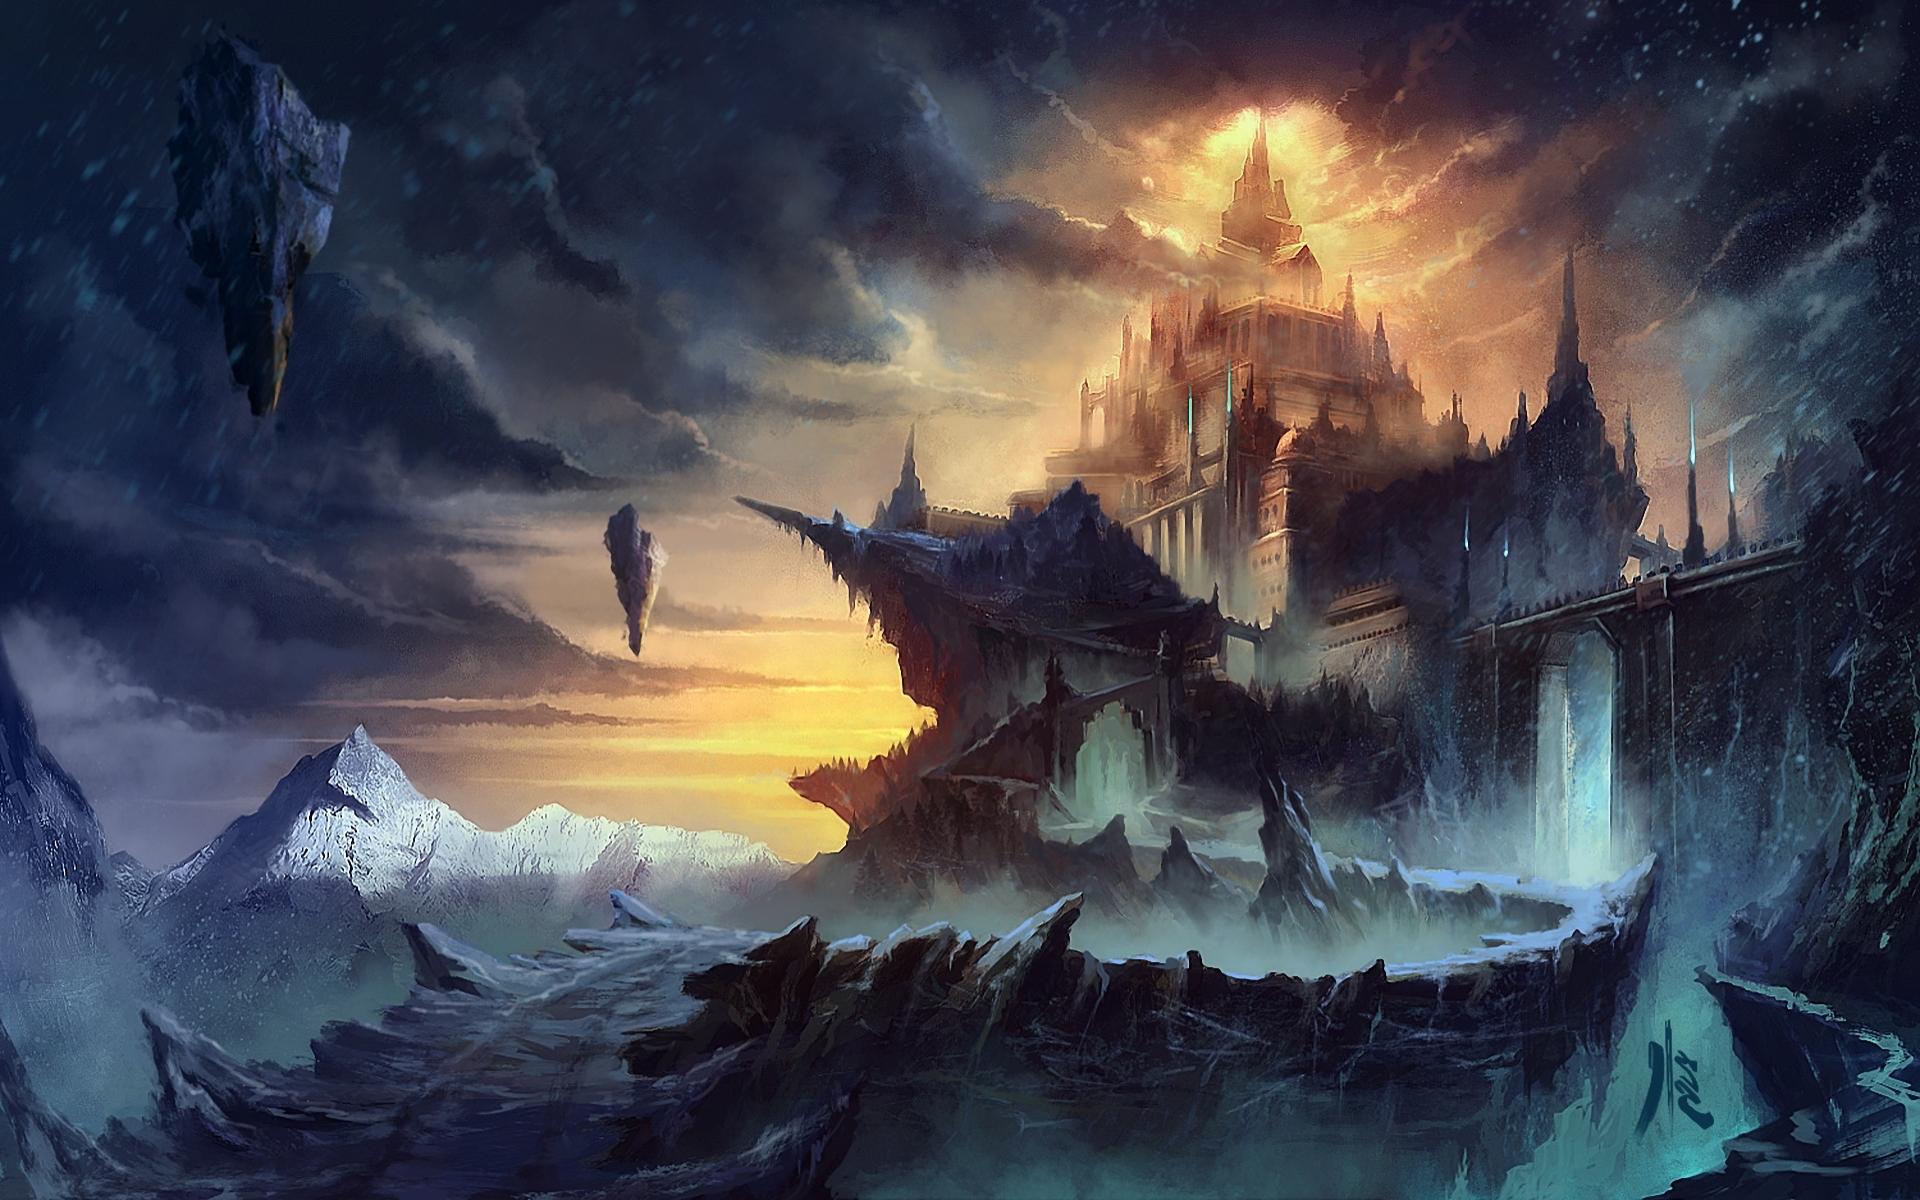 Fantasy world artwork